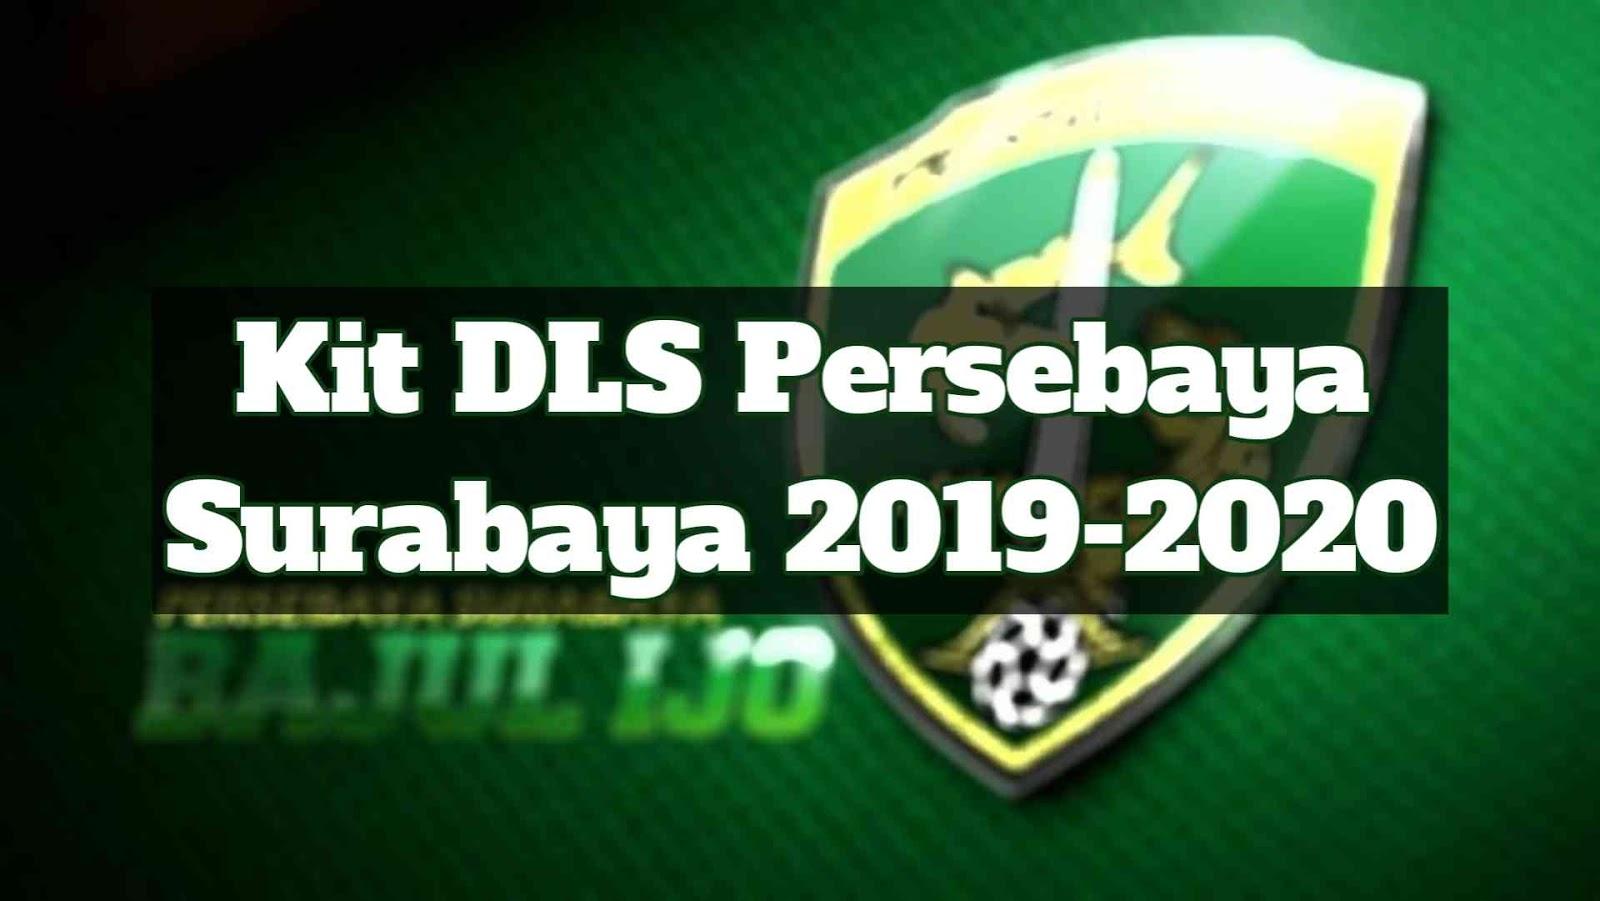 Kit DLS Persebaya Surabaya 2019 2020